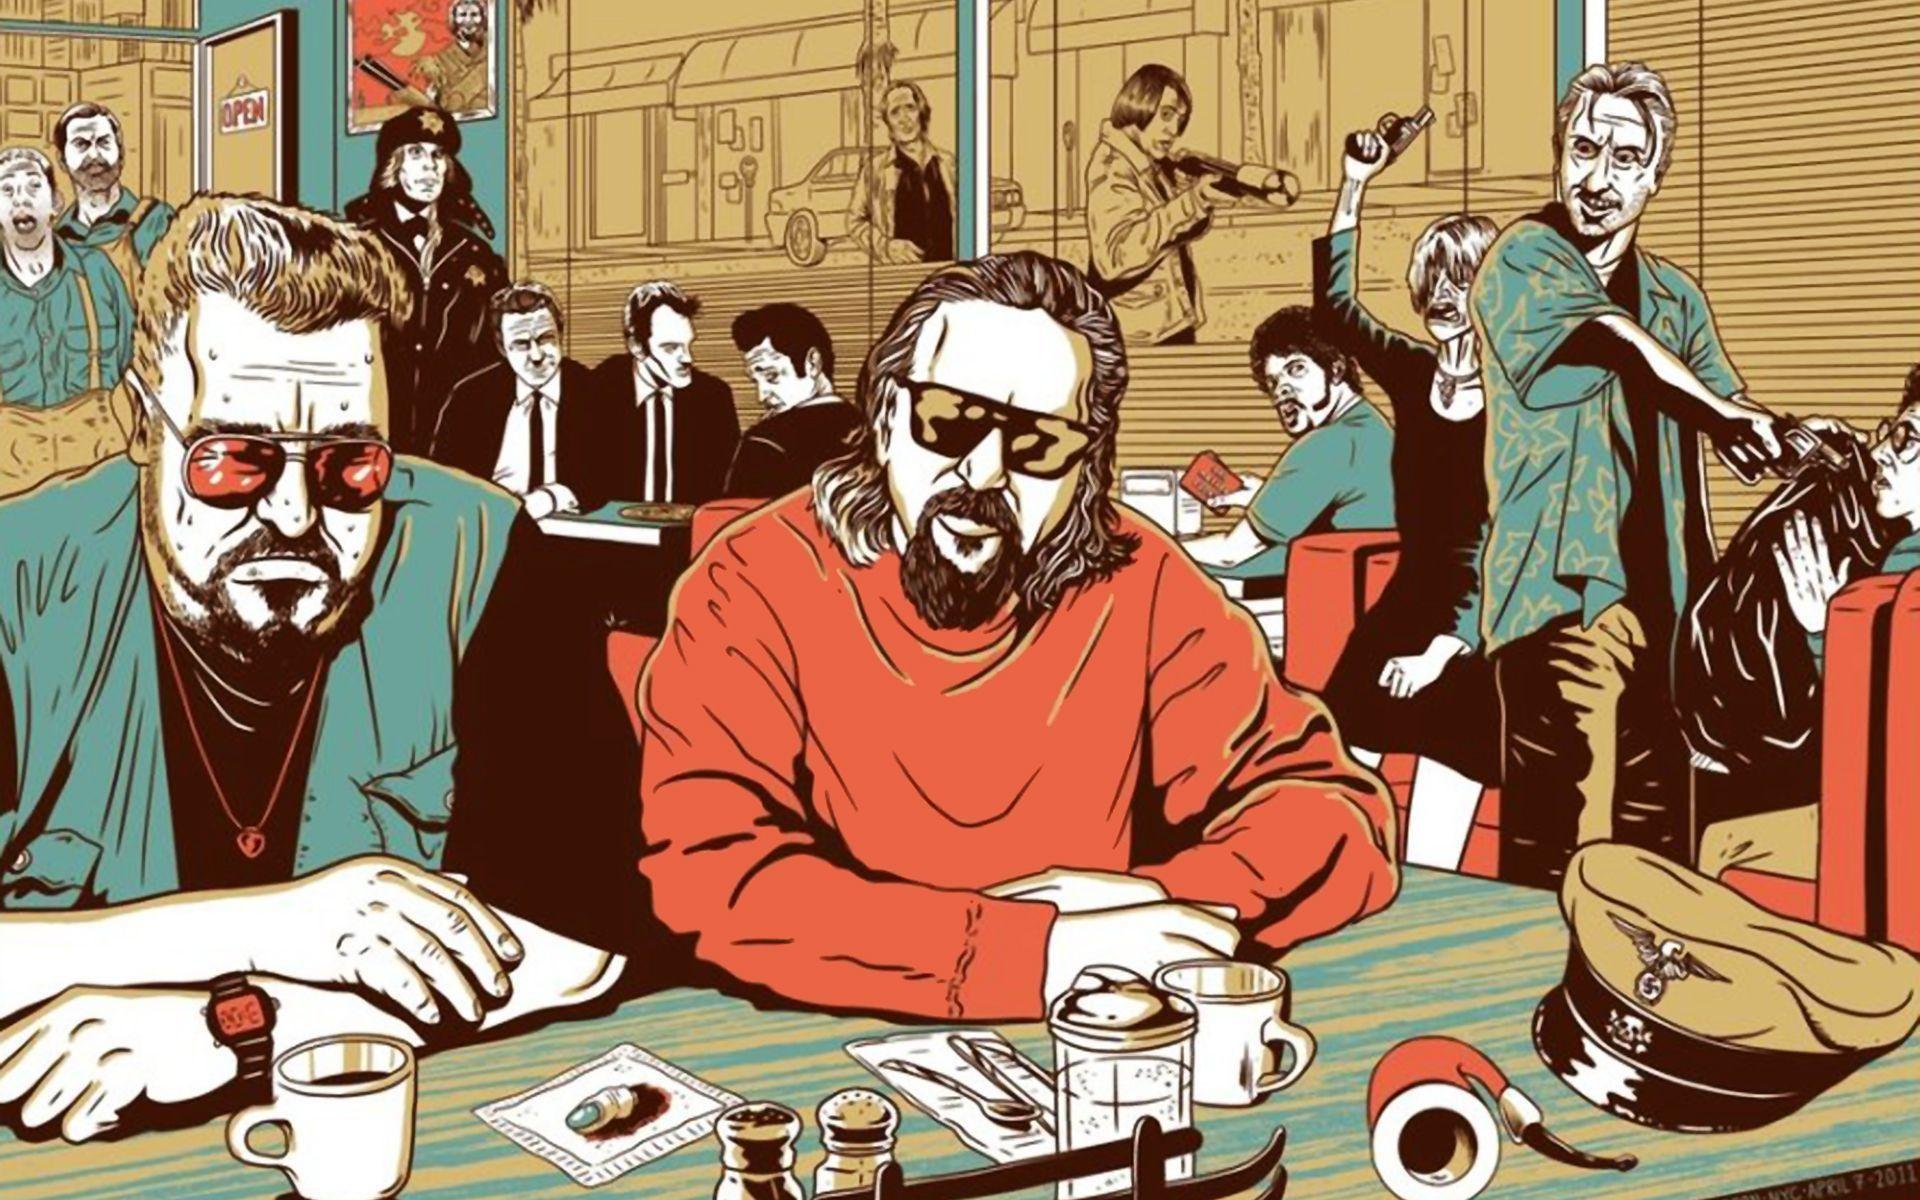 <b>Pulp Fiction Wallpaper</b> HD – WallpaperSafari